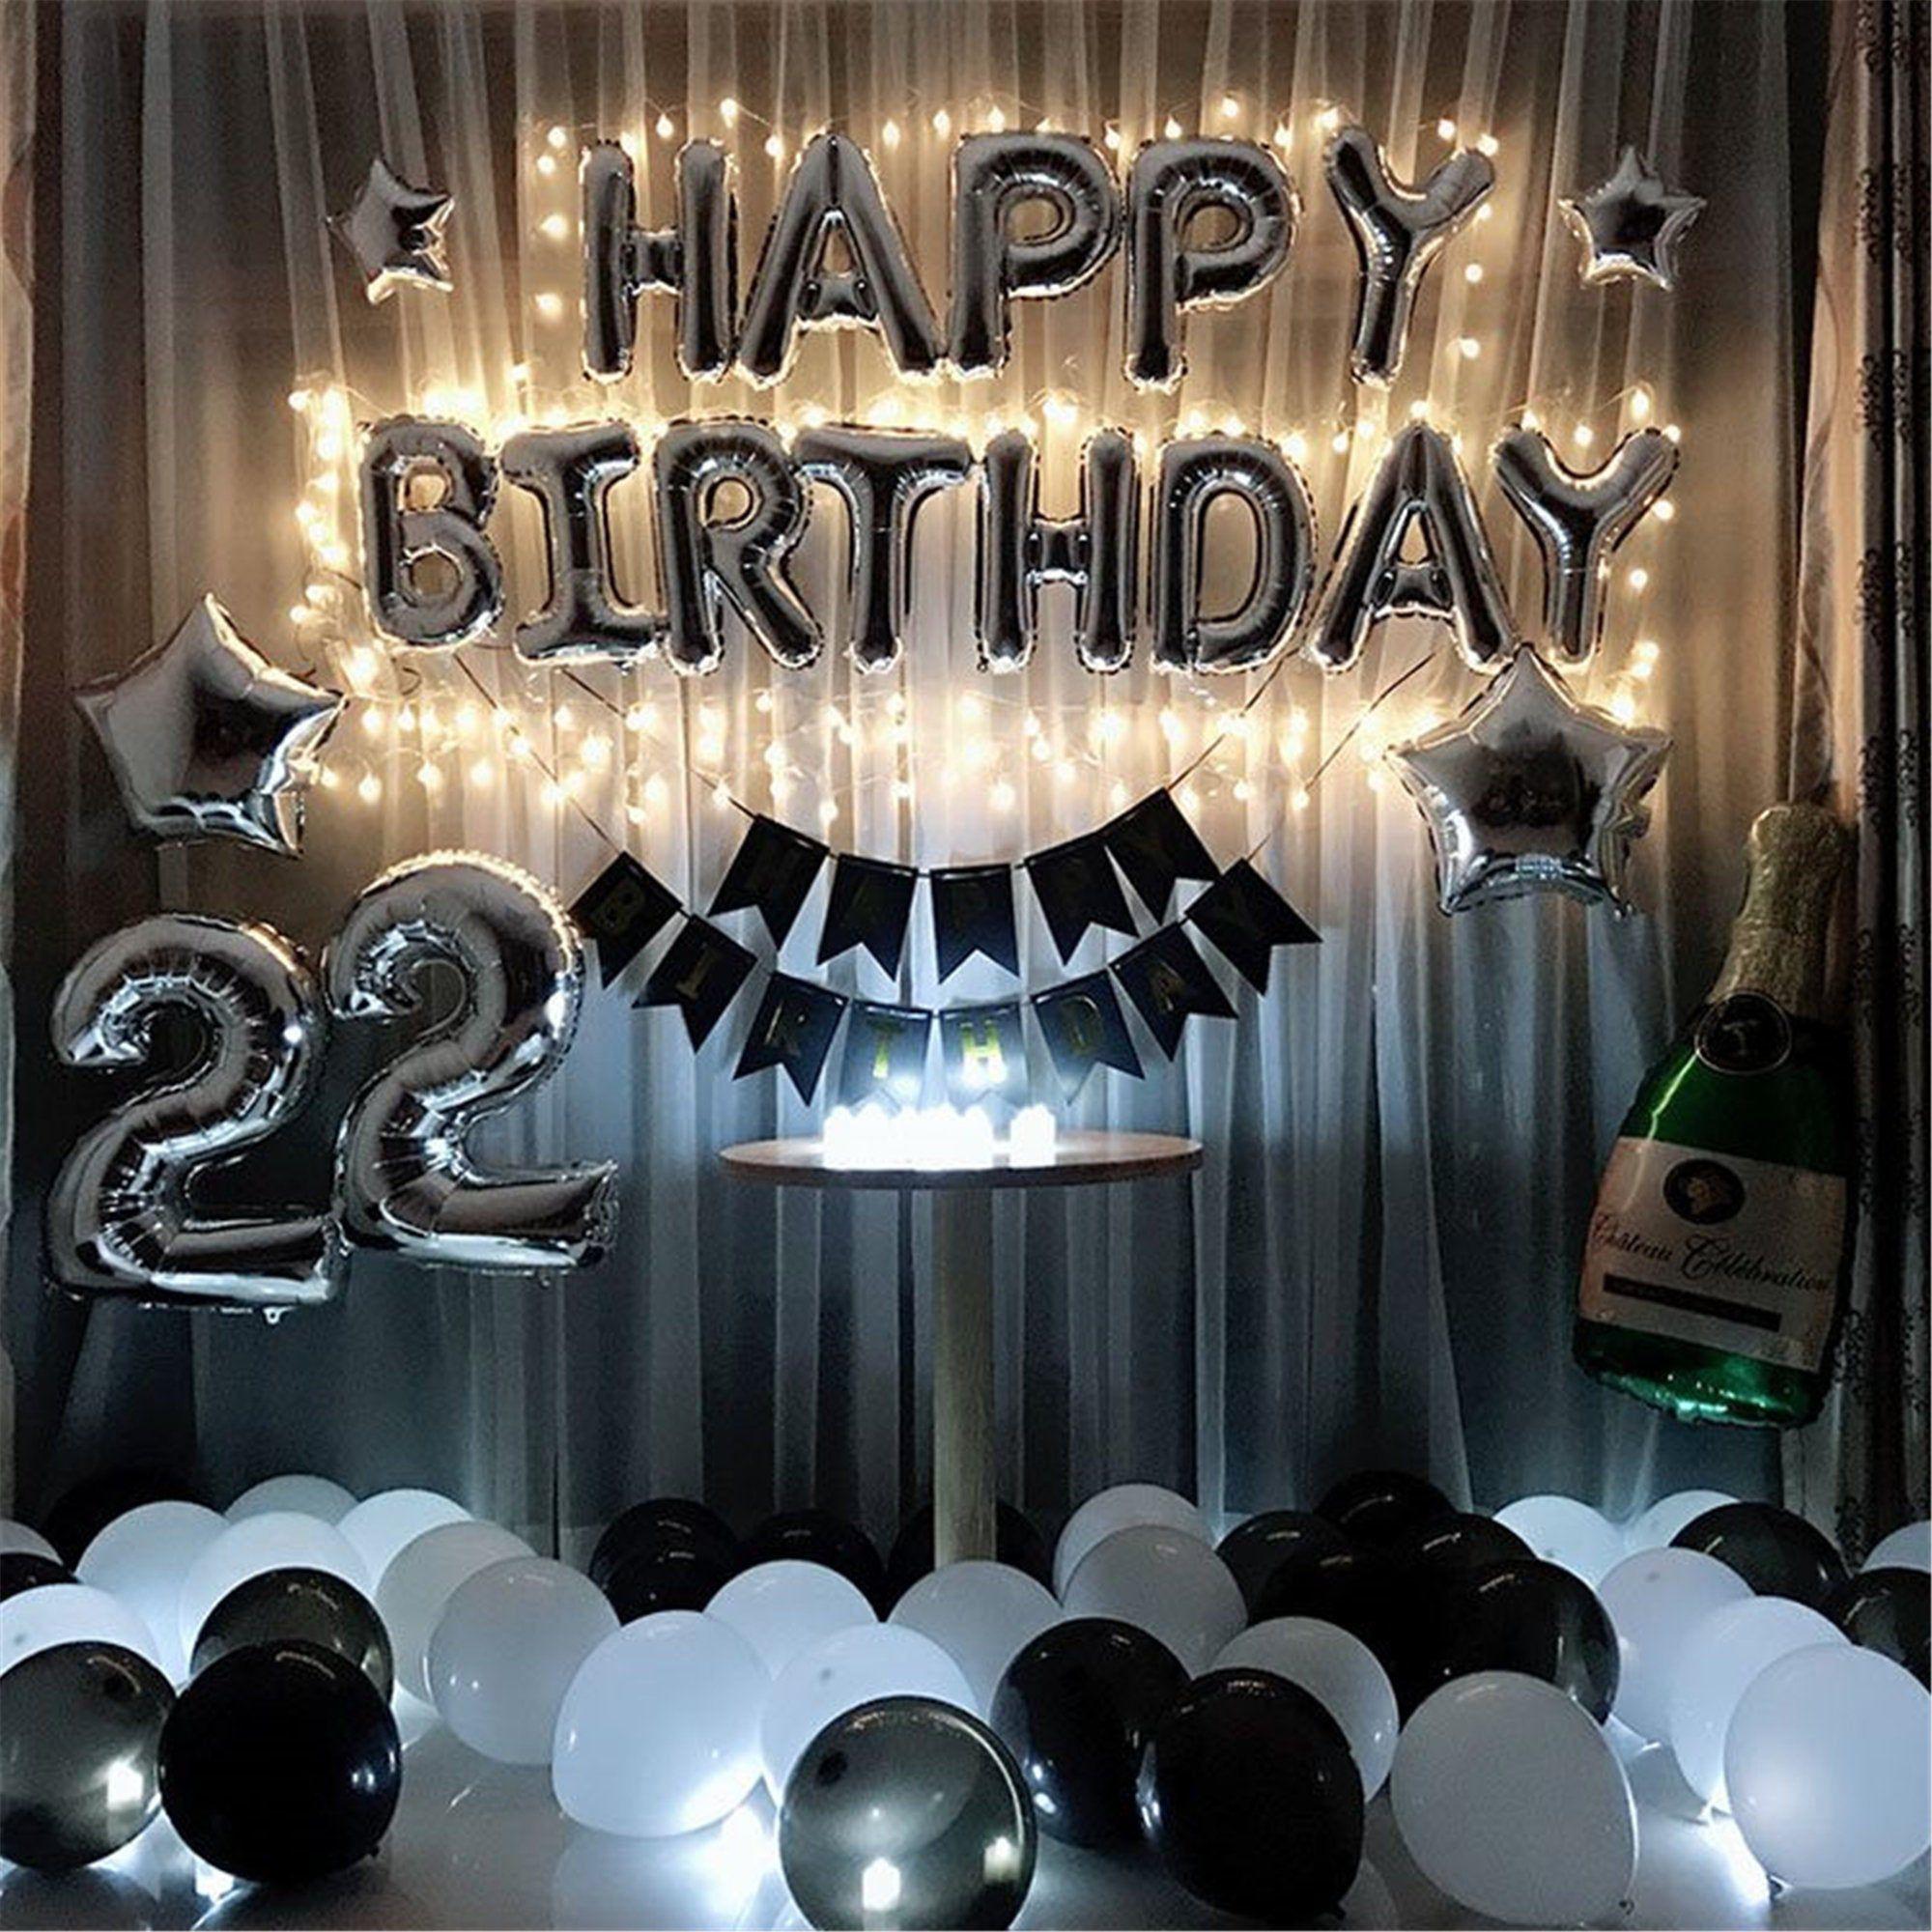 Birthday Balloon Kit, Birthday&Wedding Decorations, Baby Shower Decorations, Birthday Party Balloons, Hen Party Decorations, Party Backdrop